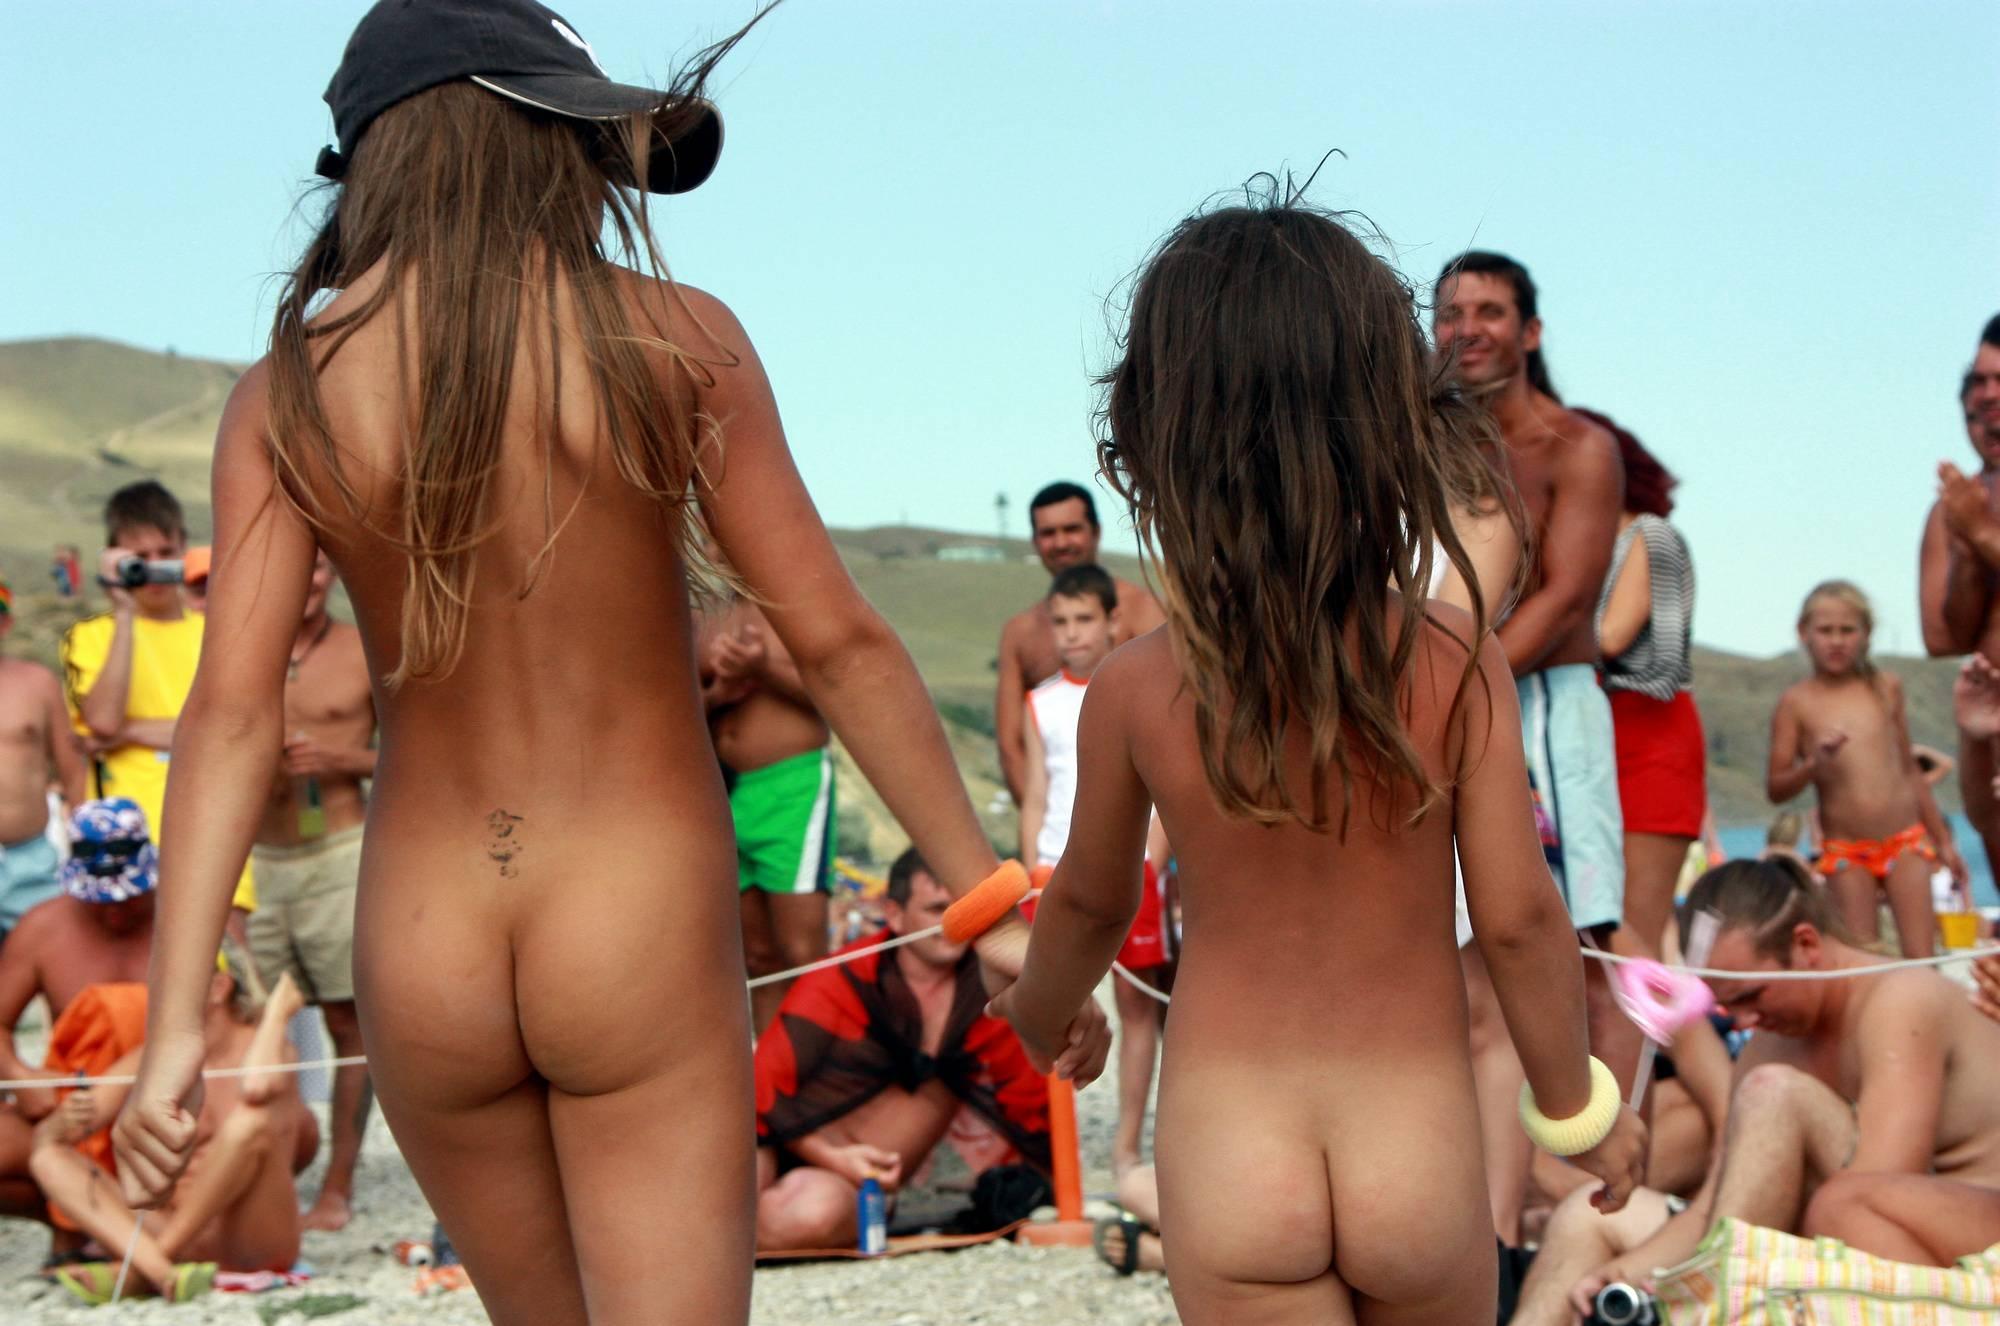 Nudist Duet Girl Rundown - 2